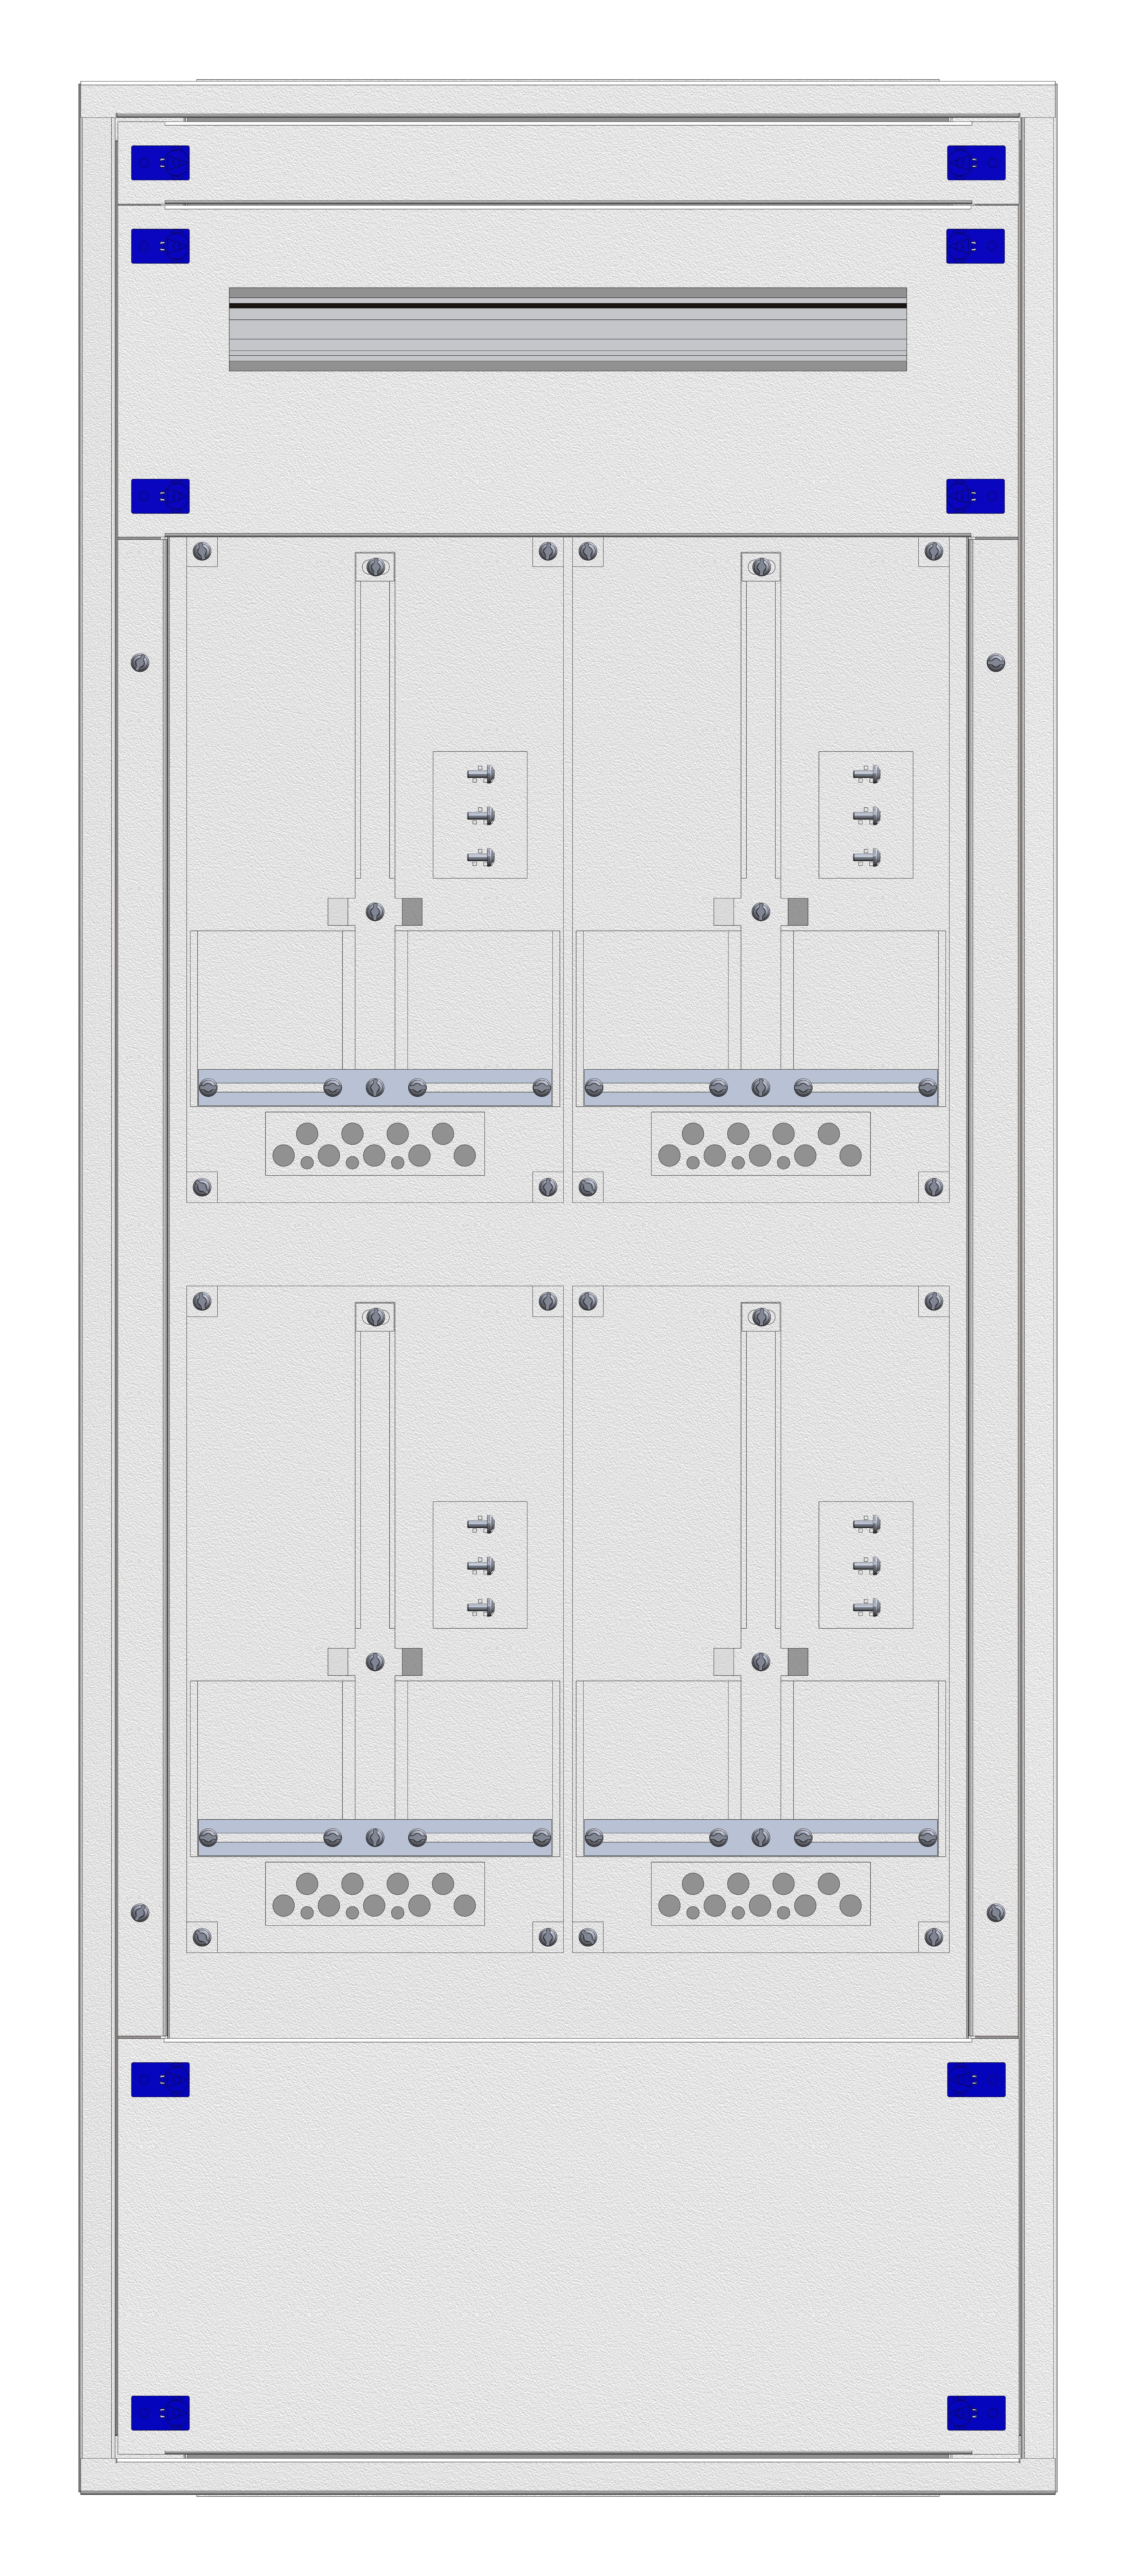 1 Stk Aufputz-Zählerverteiler 2A-28G/TIR 4ZP, H1380B590T250mm IL162228TS